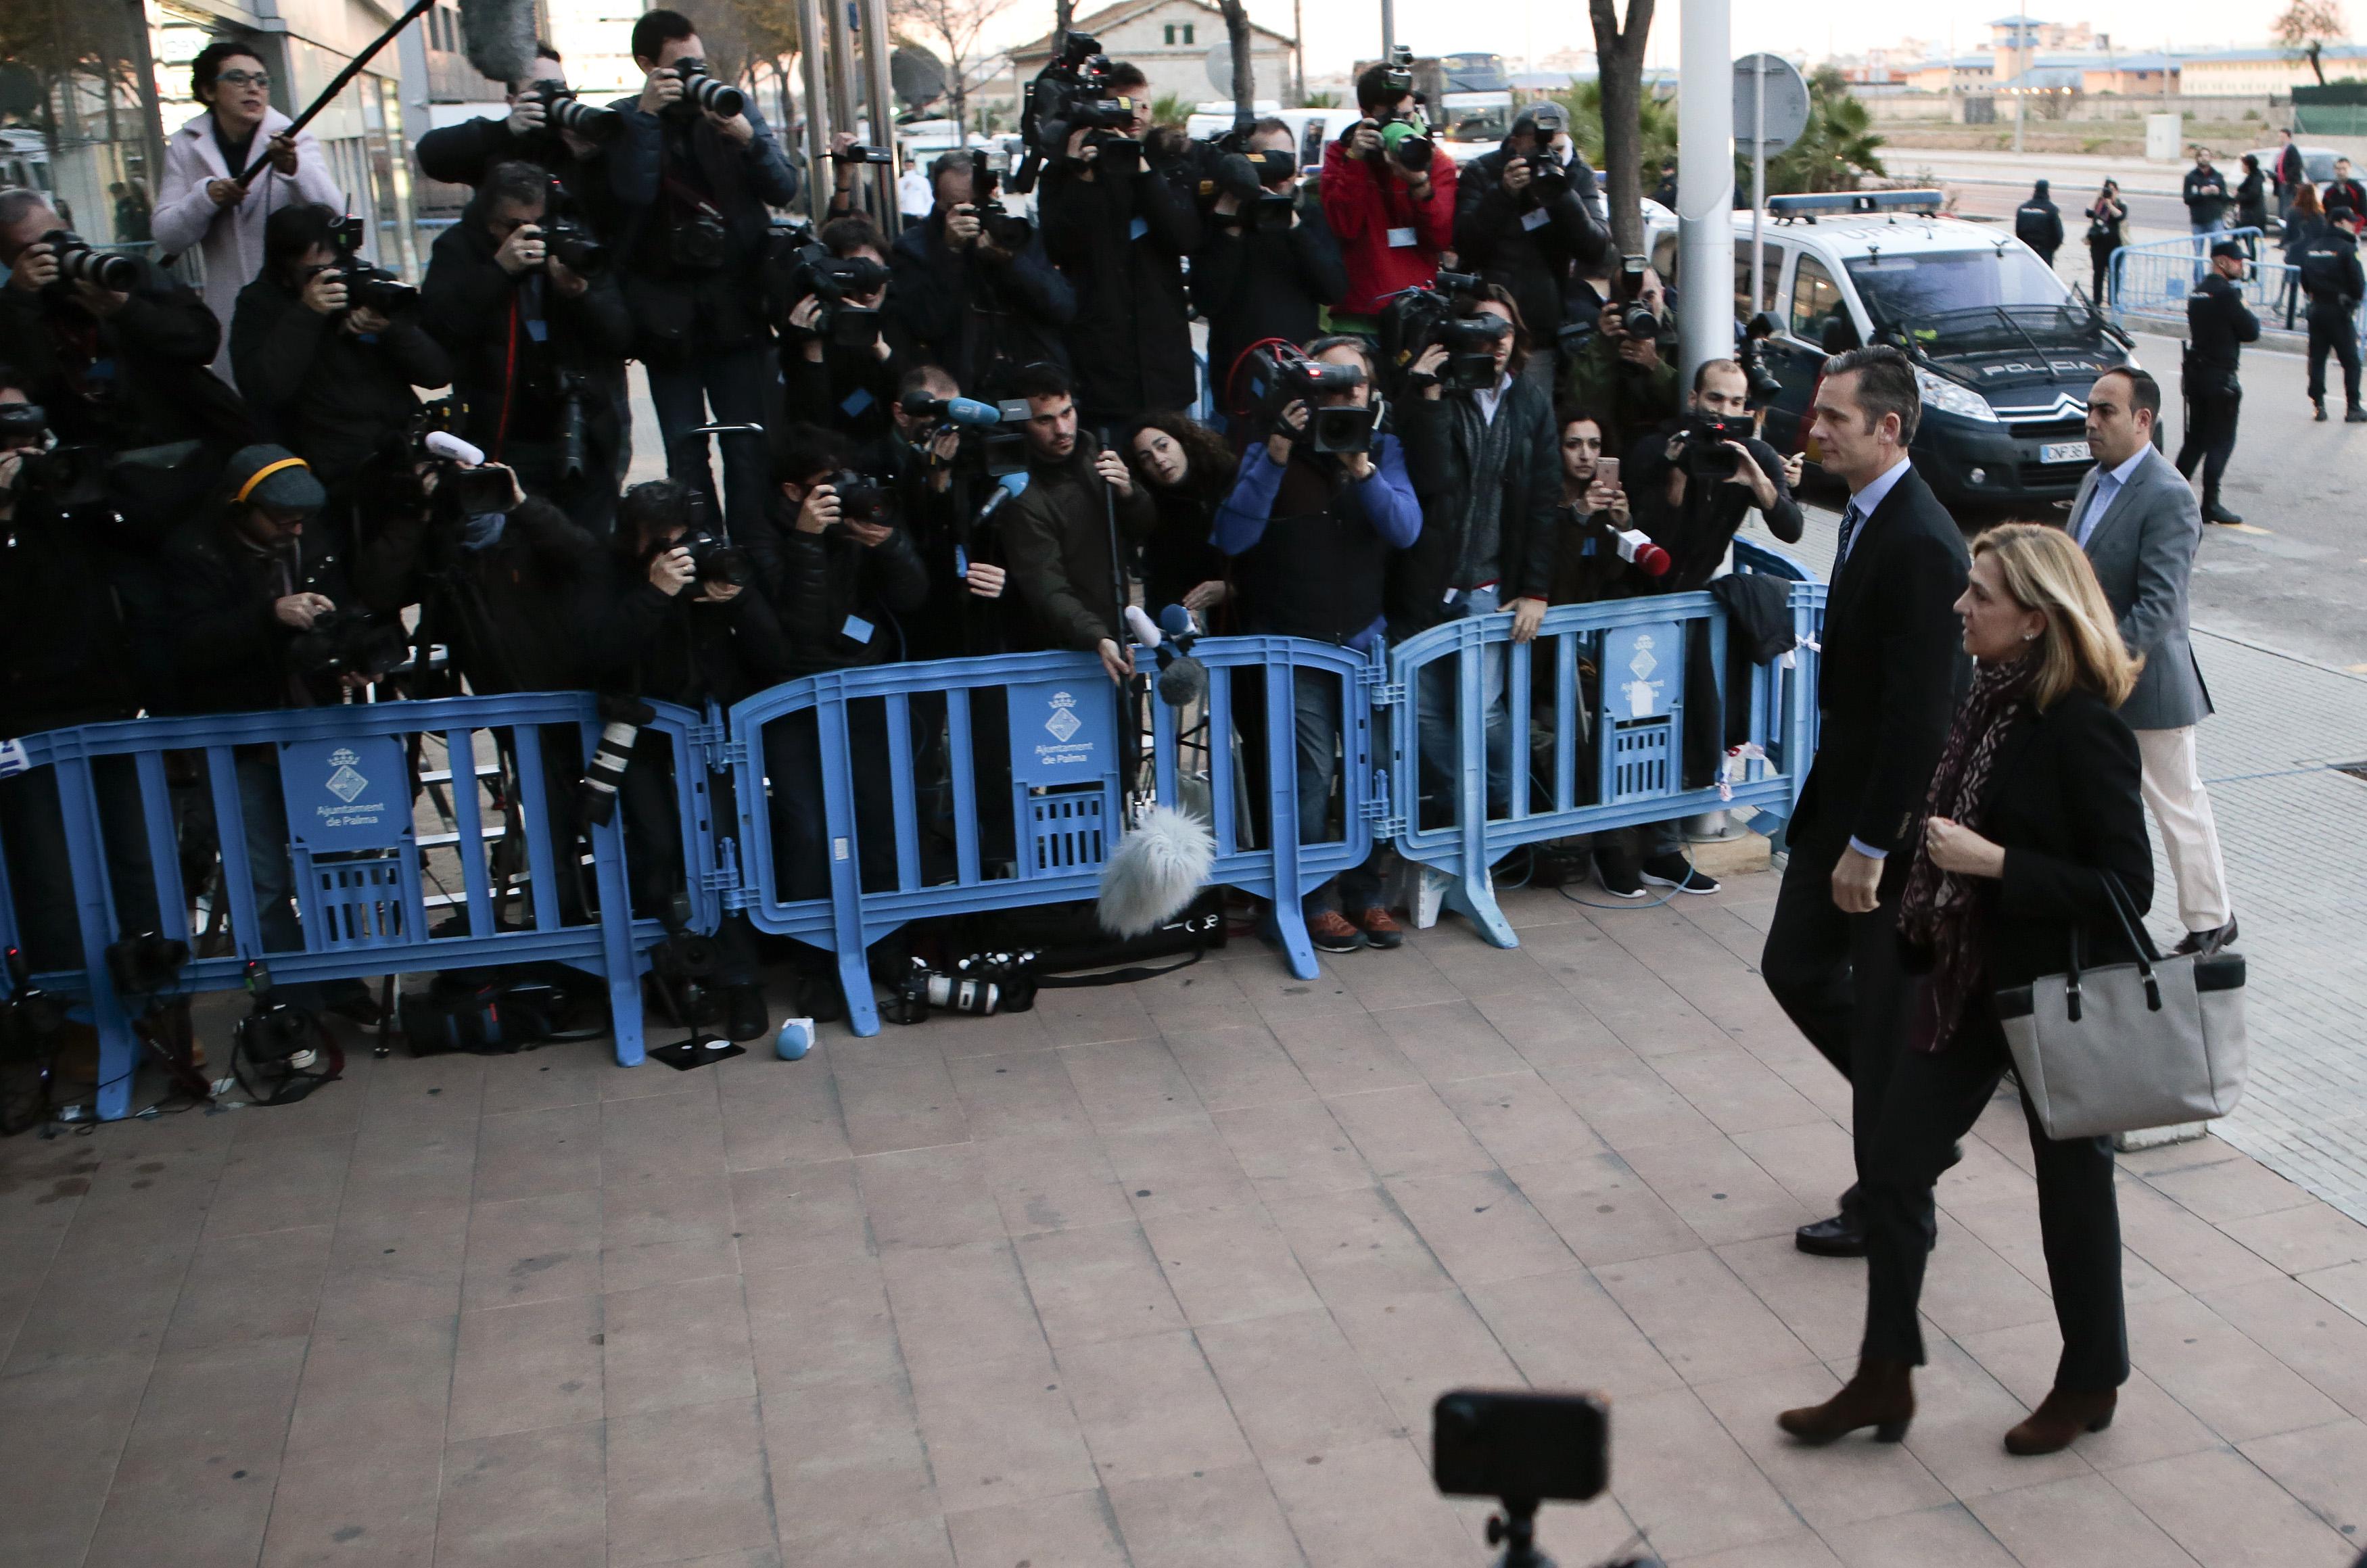 Cristina de Borbón e Iñaki Urdangarin a su llegada a los juzgados. . Reuters